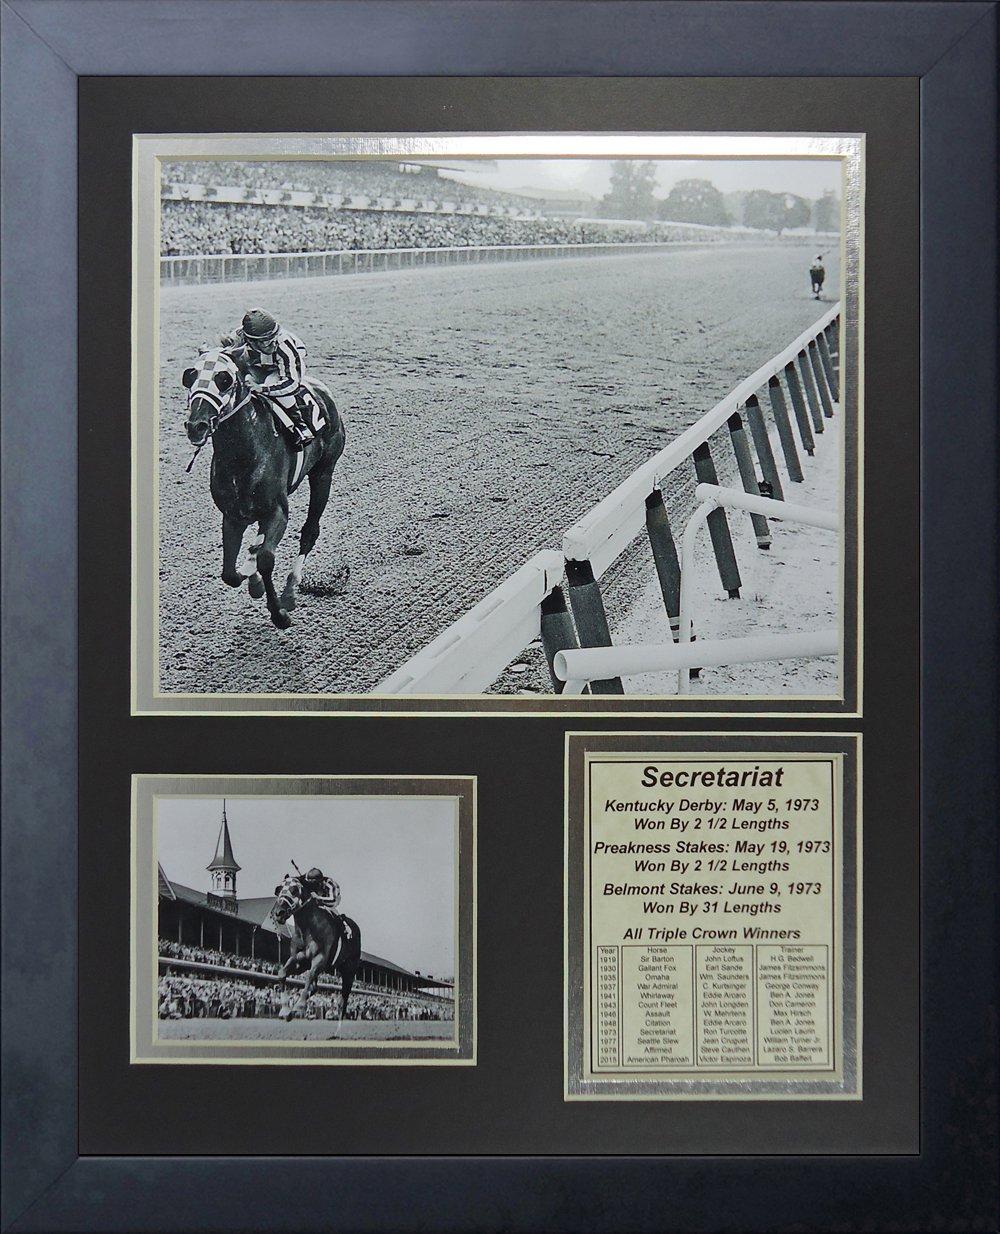 Legends Never Die Secretariat 1973 Triple Crown Winner Framed Photo Collage, 11'' X 14'' by Legends Never Die